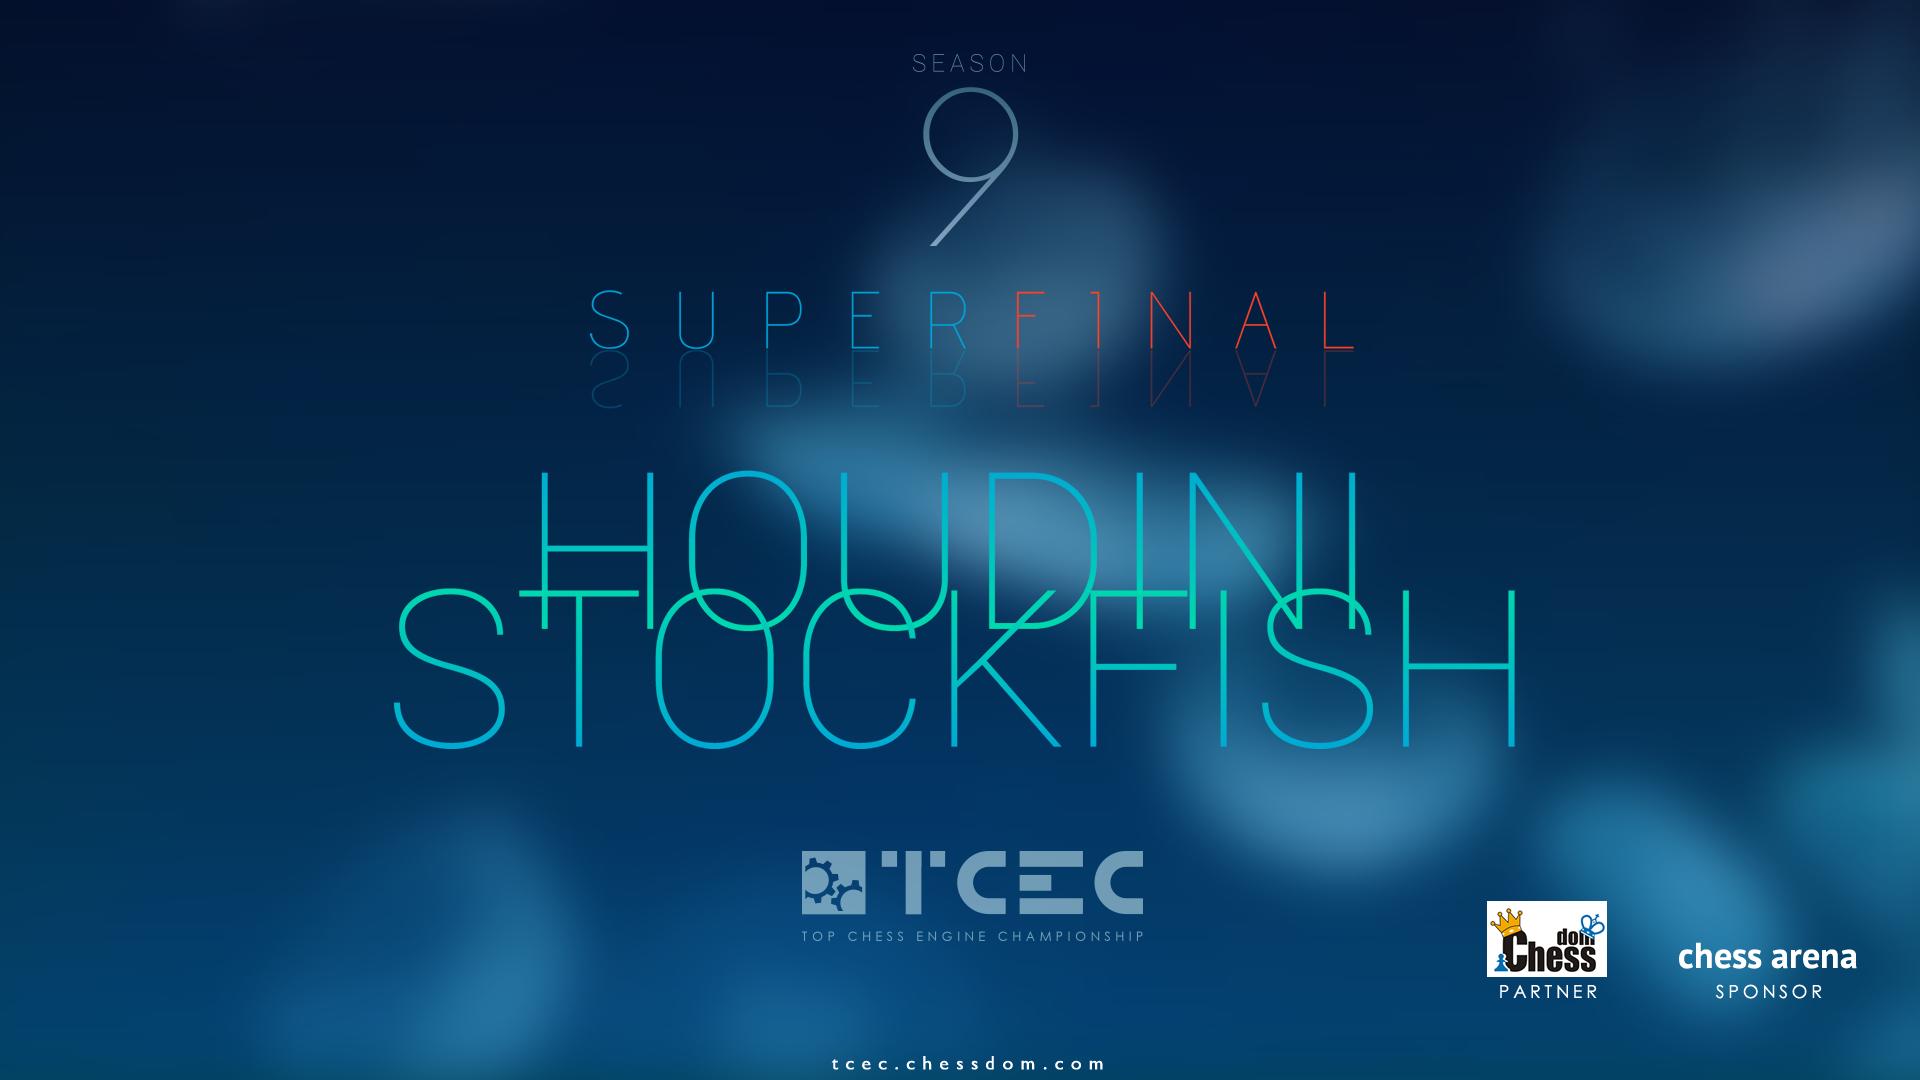 Stockfish is the TCEC Season 9 Grand Champion | Chessdom